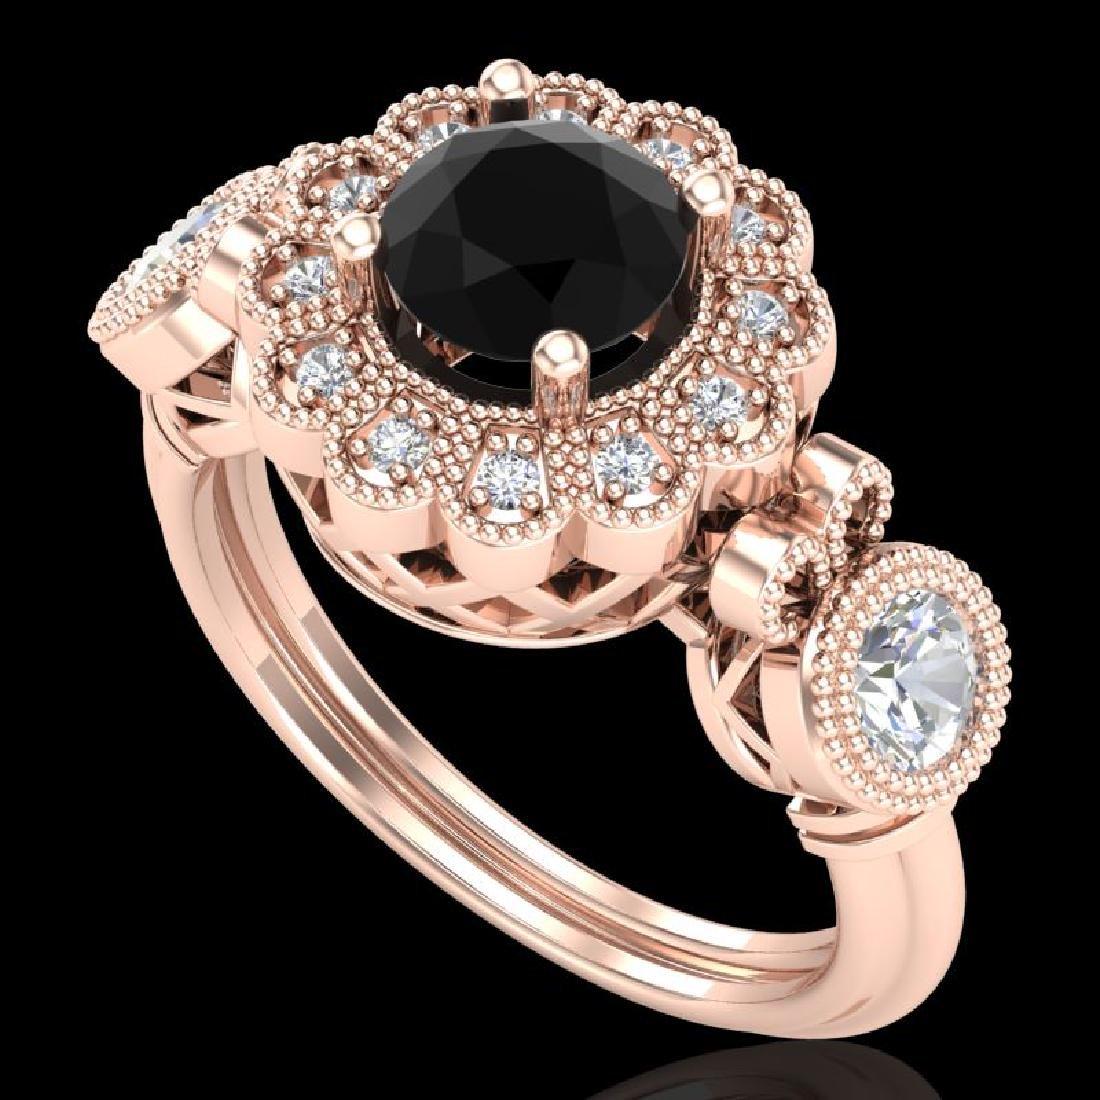 1.5 CTW Fancy Black Diamond Solitaire Art Deco 3 Stone